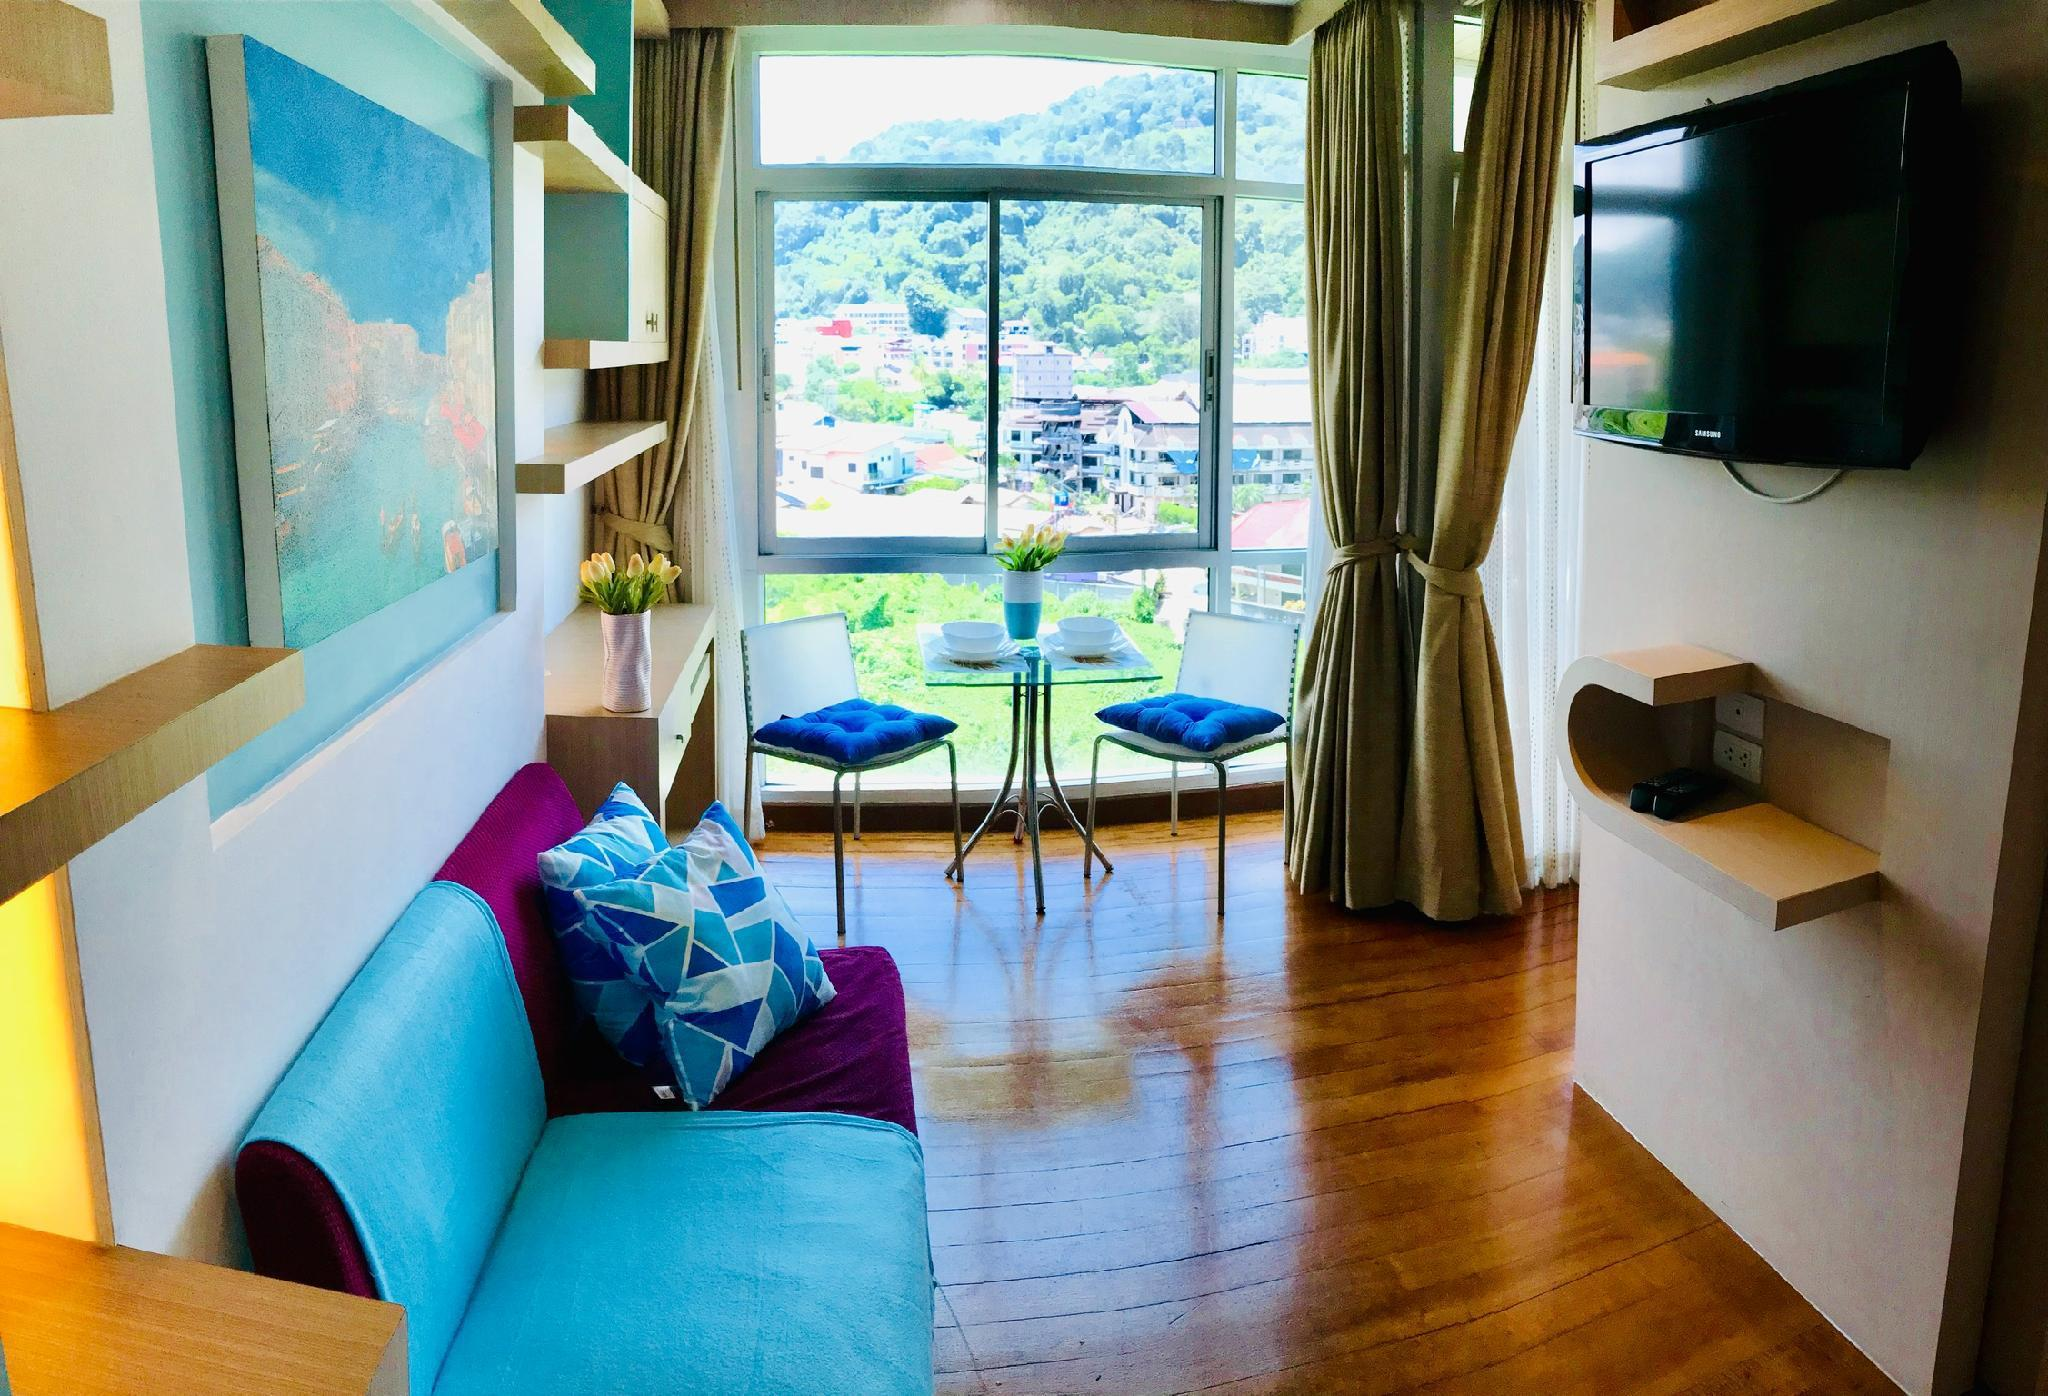 Light&Bright Apartment at Patong อพาร์ตเมนต์ 1 ห้องนอน 1 ห้องน้ำส่วนตัว ขนาด 30 ตร.ม. – ป่าตอง